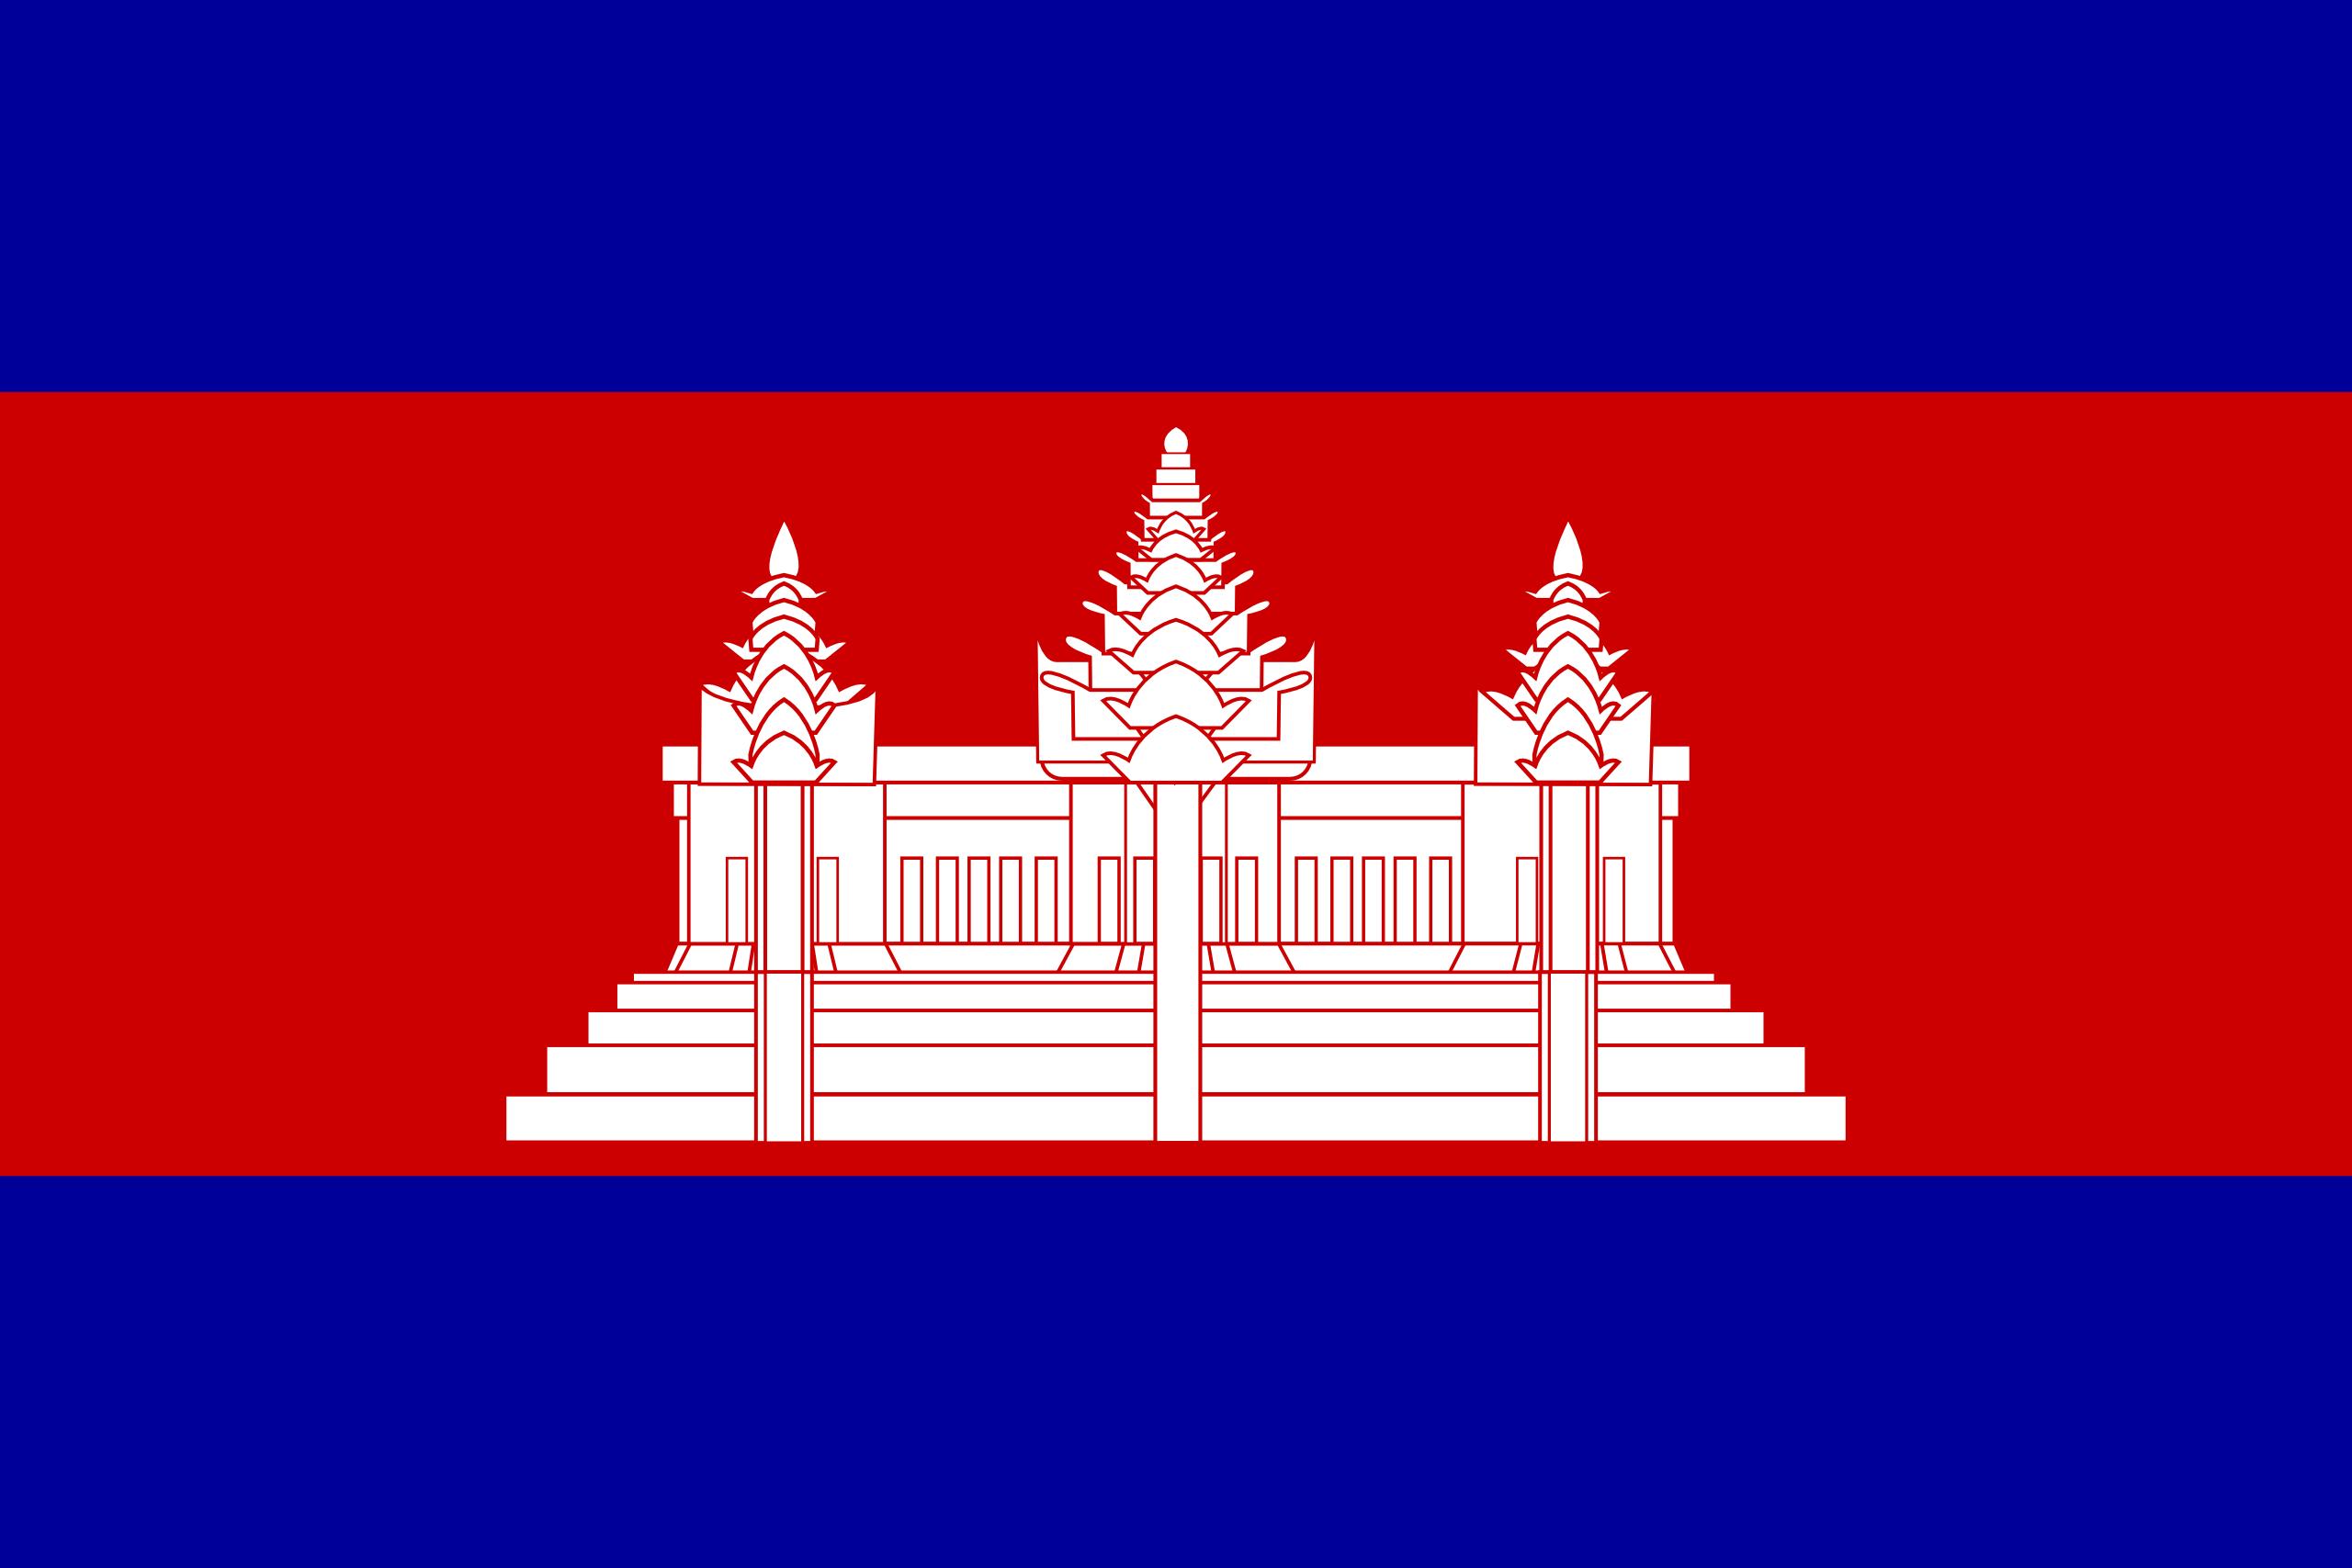 कंबोडिया, देश, emblema, लोग�प्रतीकbolo - HD वॉलपेपर - प्रोफेसर-falken.com